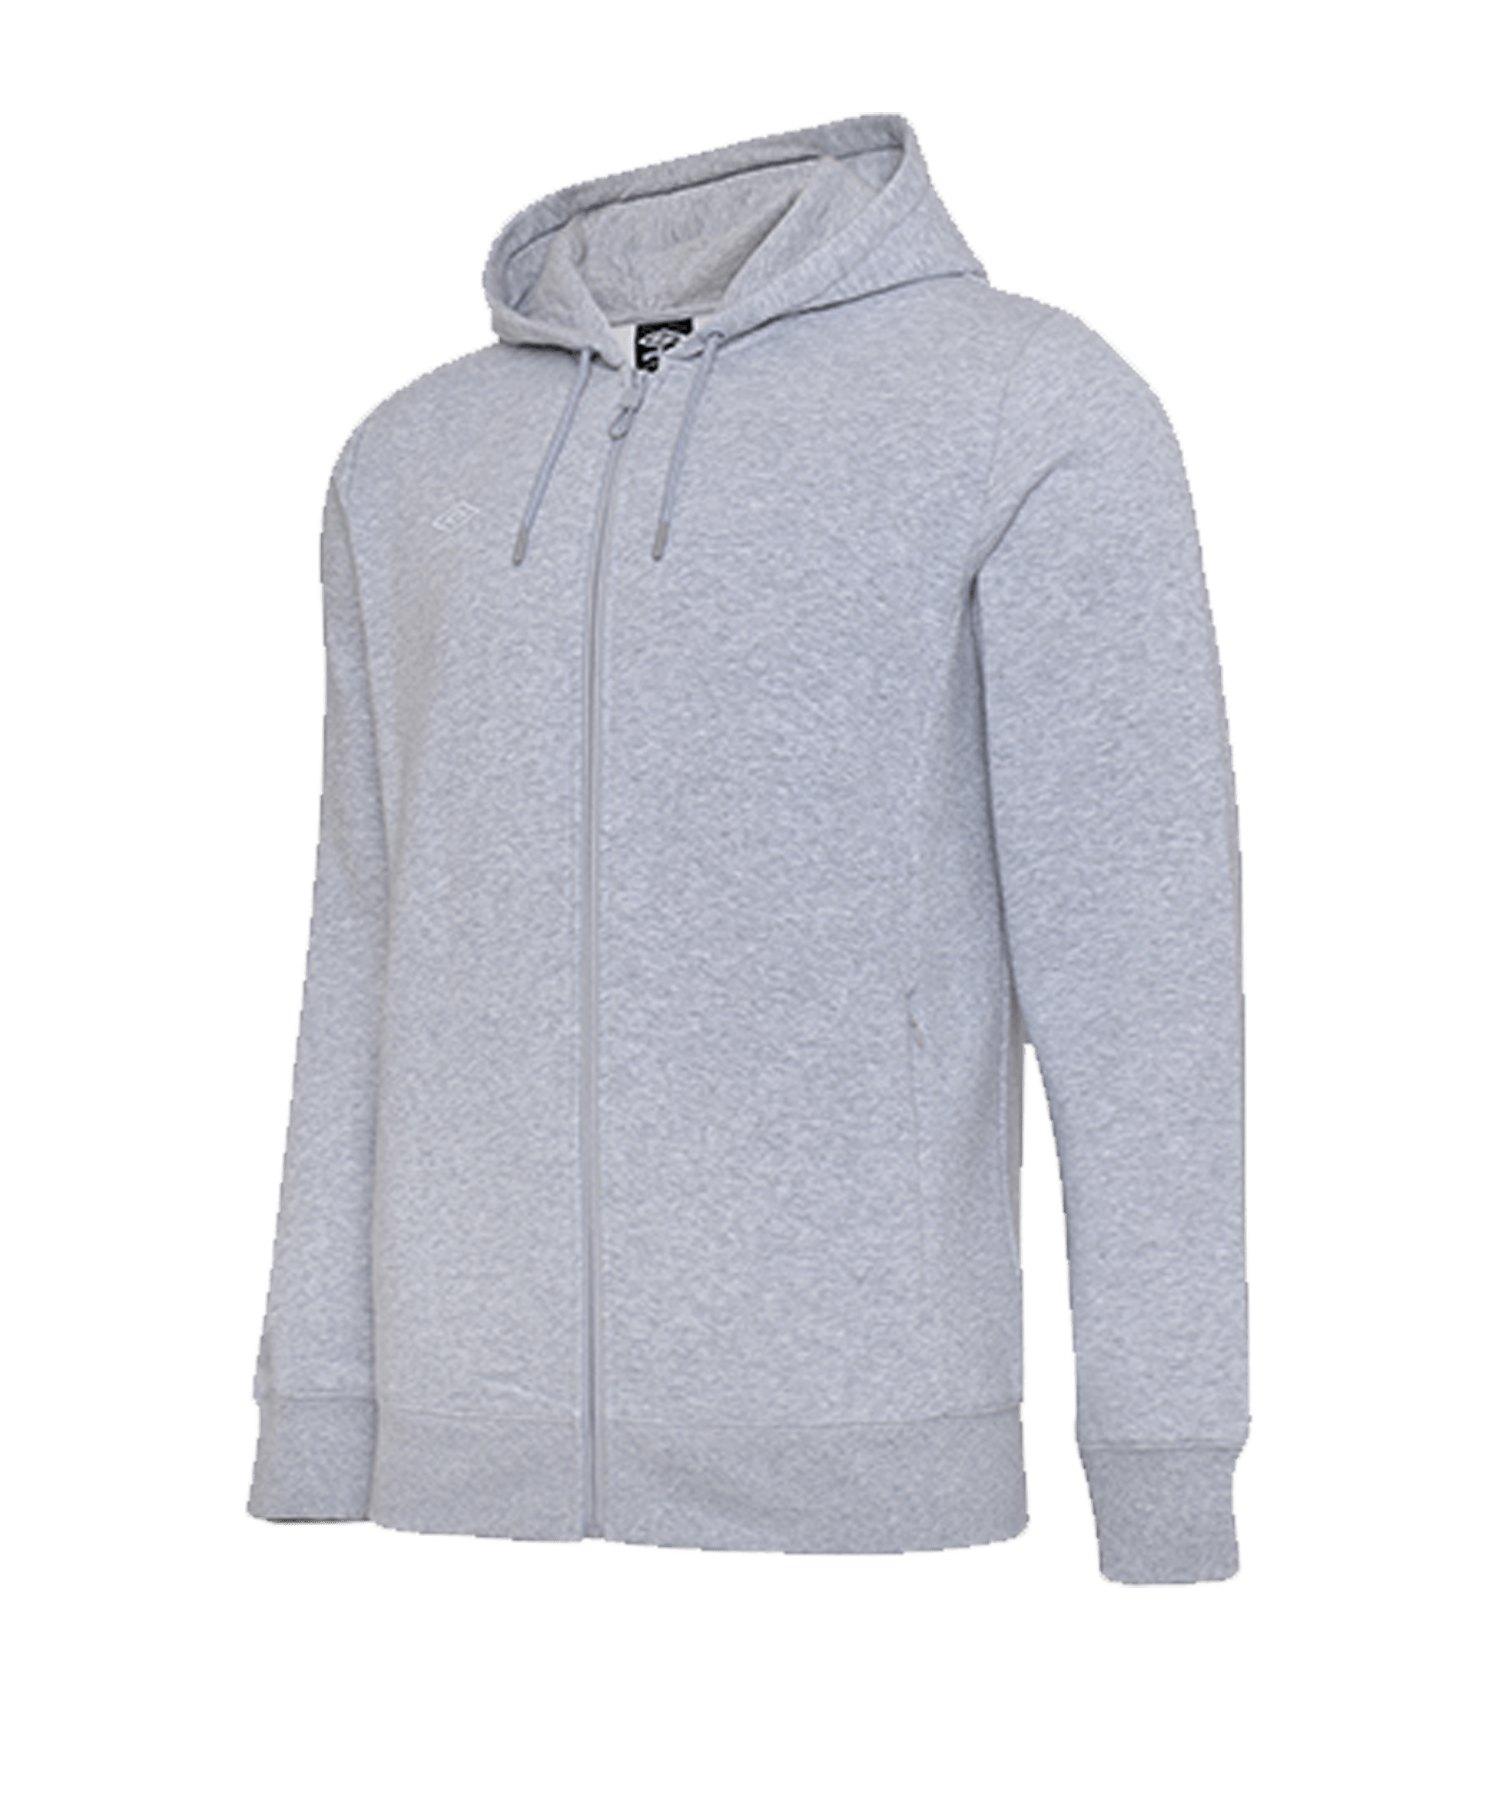 Umbro Club Leisure ZT Kapuzensweatshirt FP12 - grau